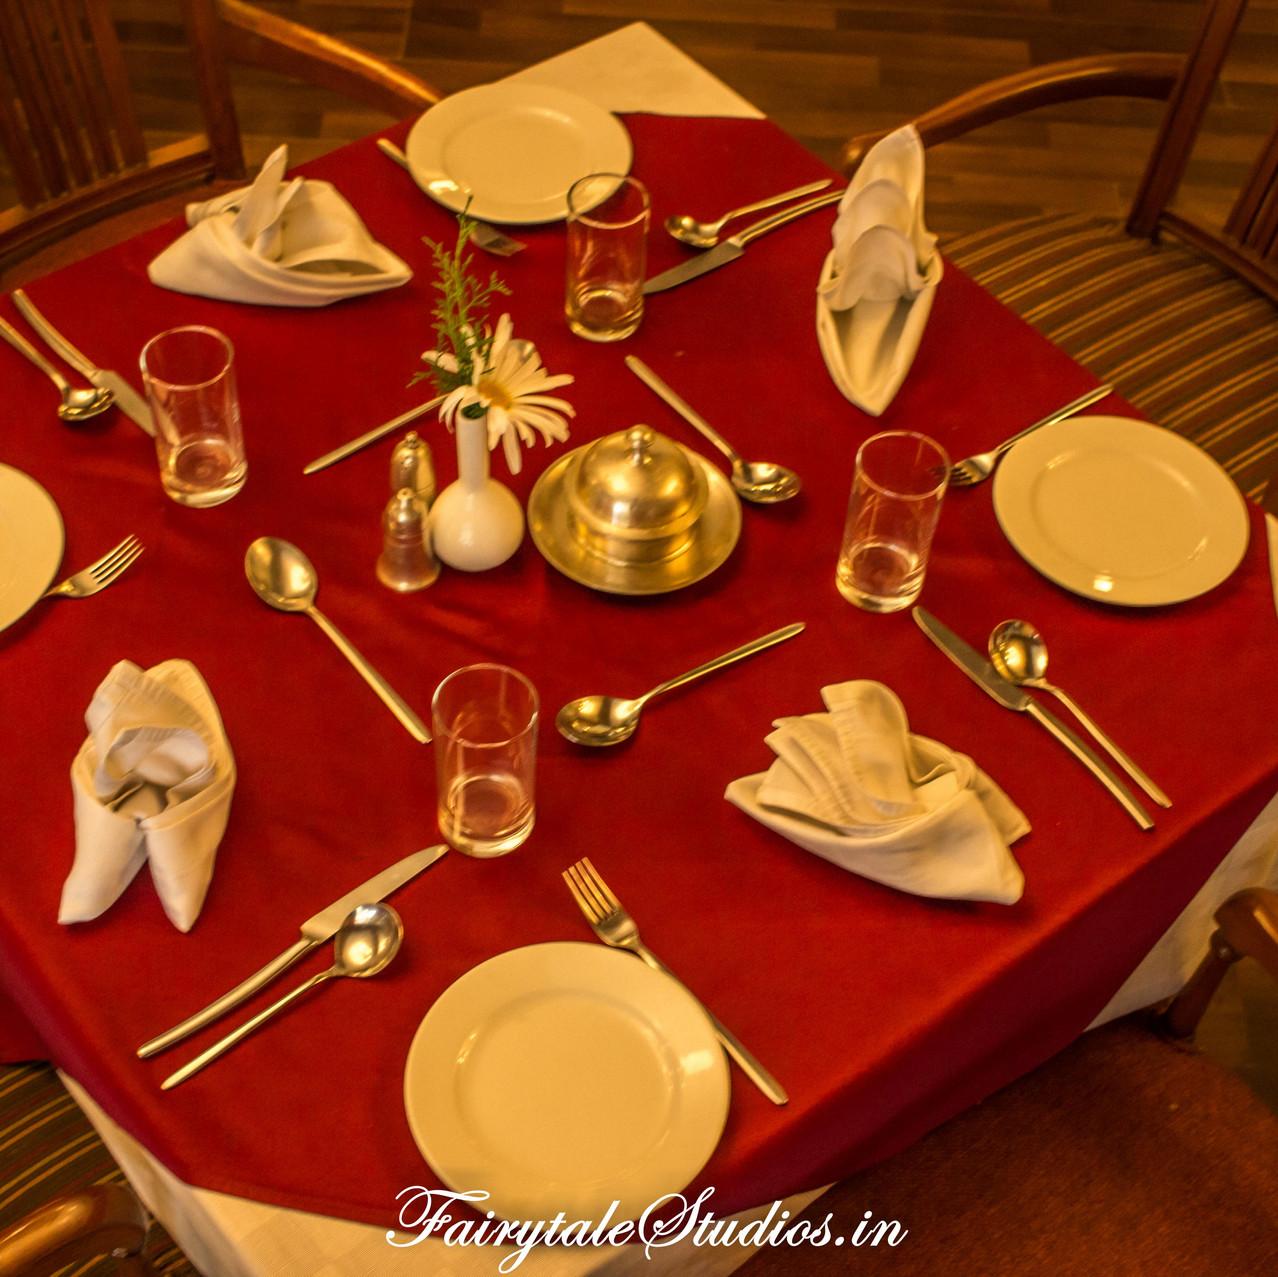 Restaurant_The Carlton Kodaikanal_Fairytale Travels (2)